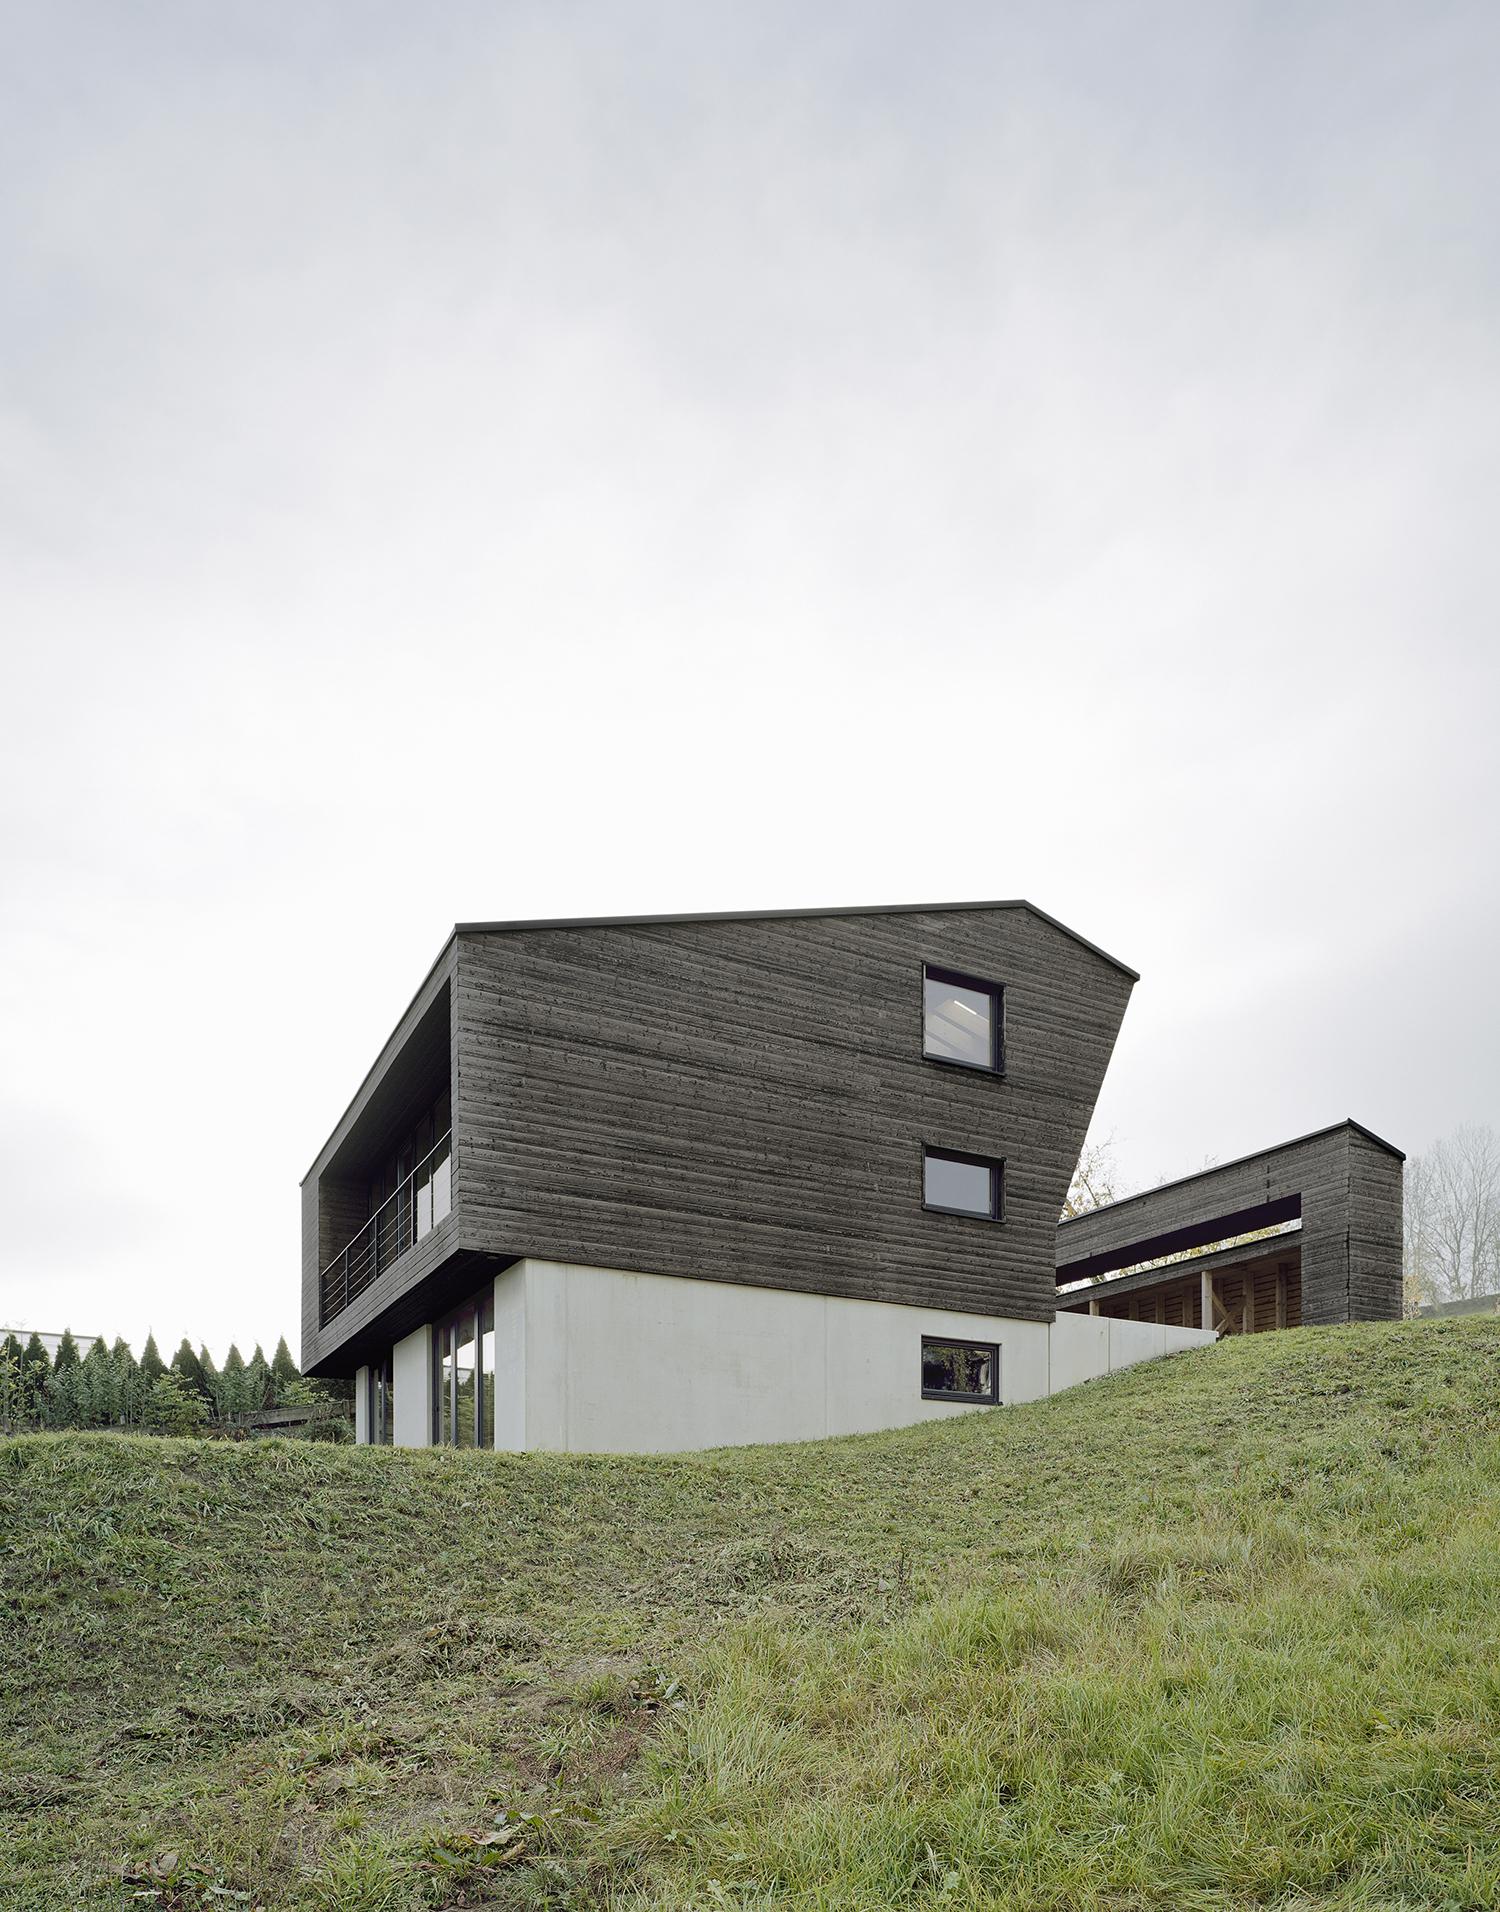 galer a de casa p yonder architektur und design 29. Black Bedroom Furniture Sets. Home Design Ideas